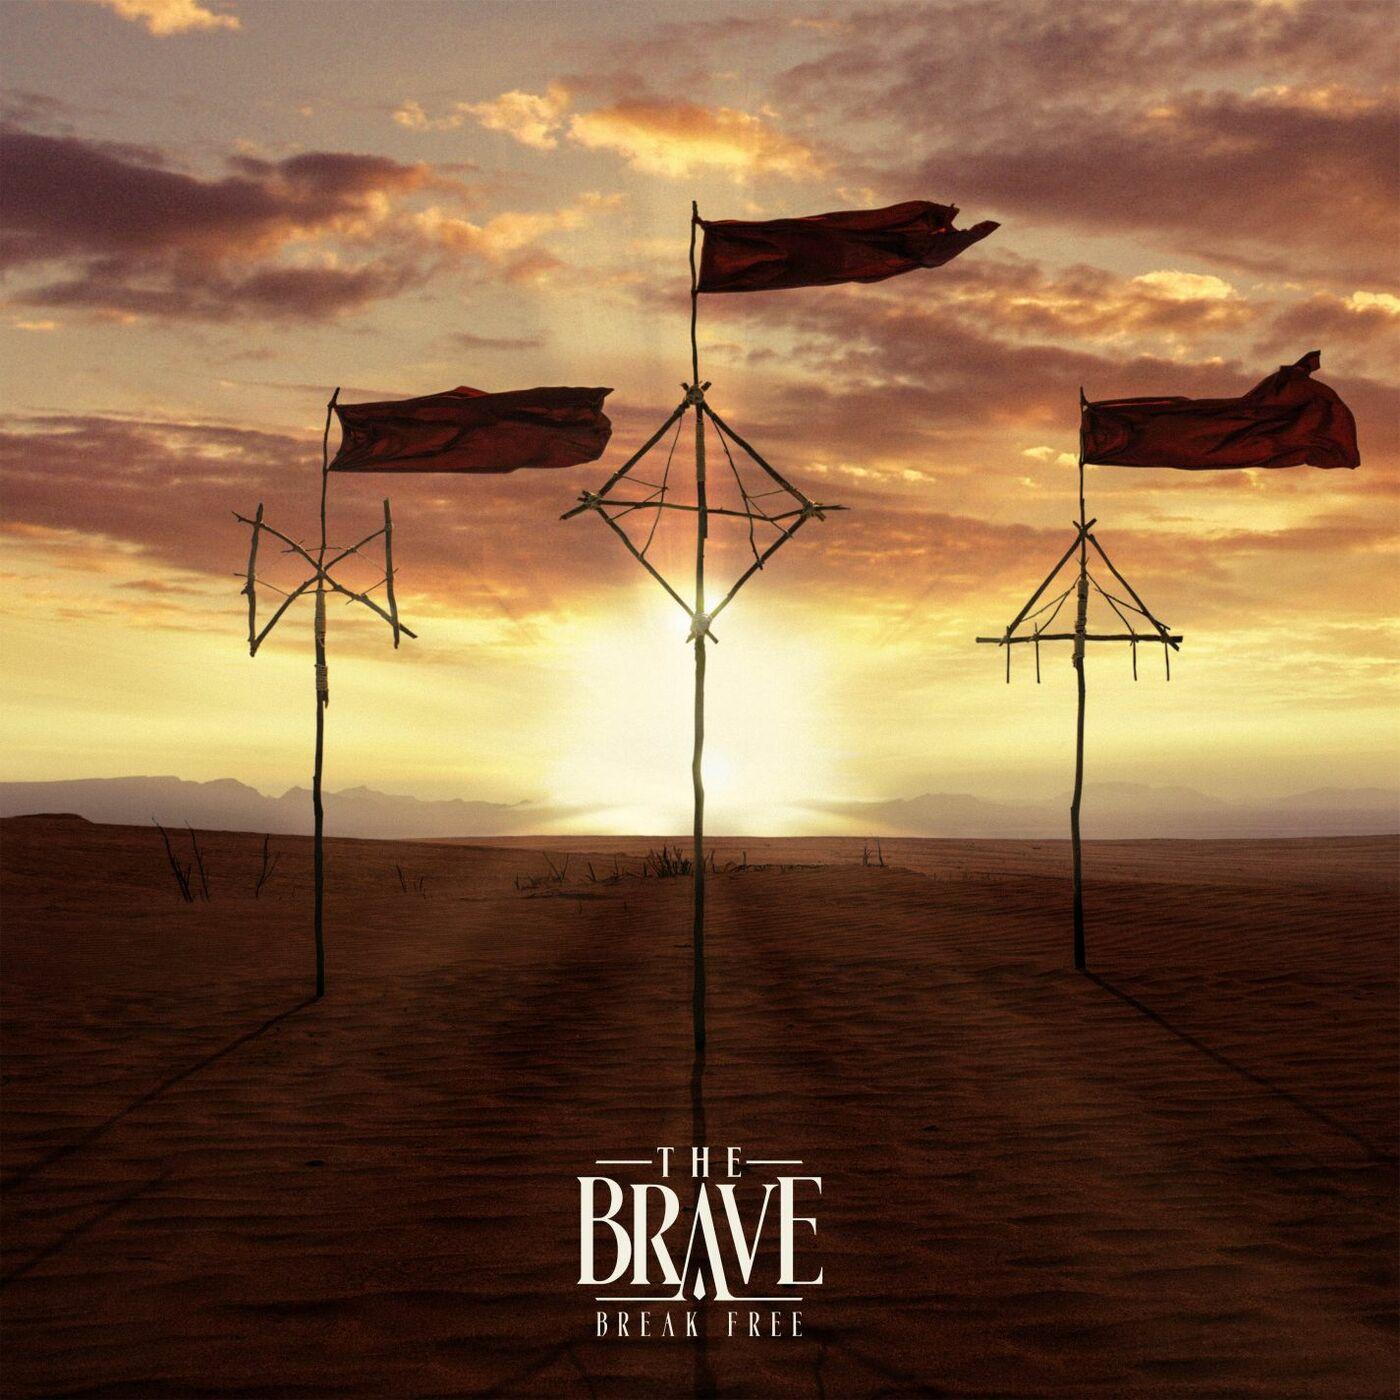 The Brave - Break Free [single] (2016)